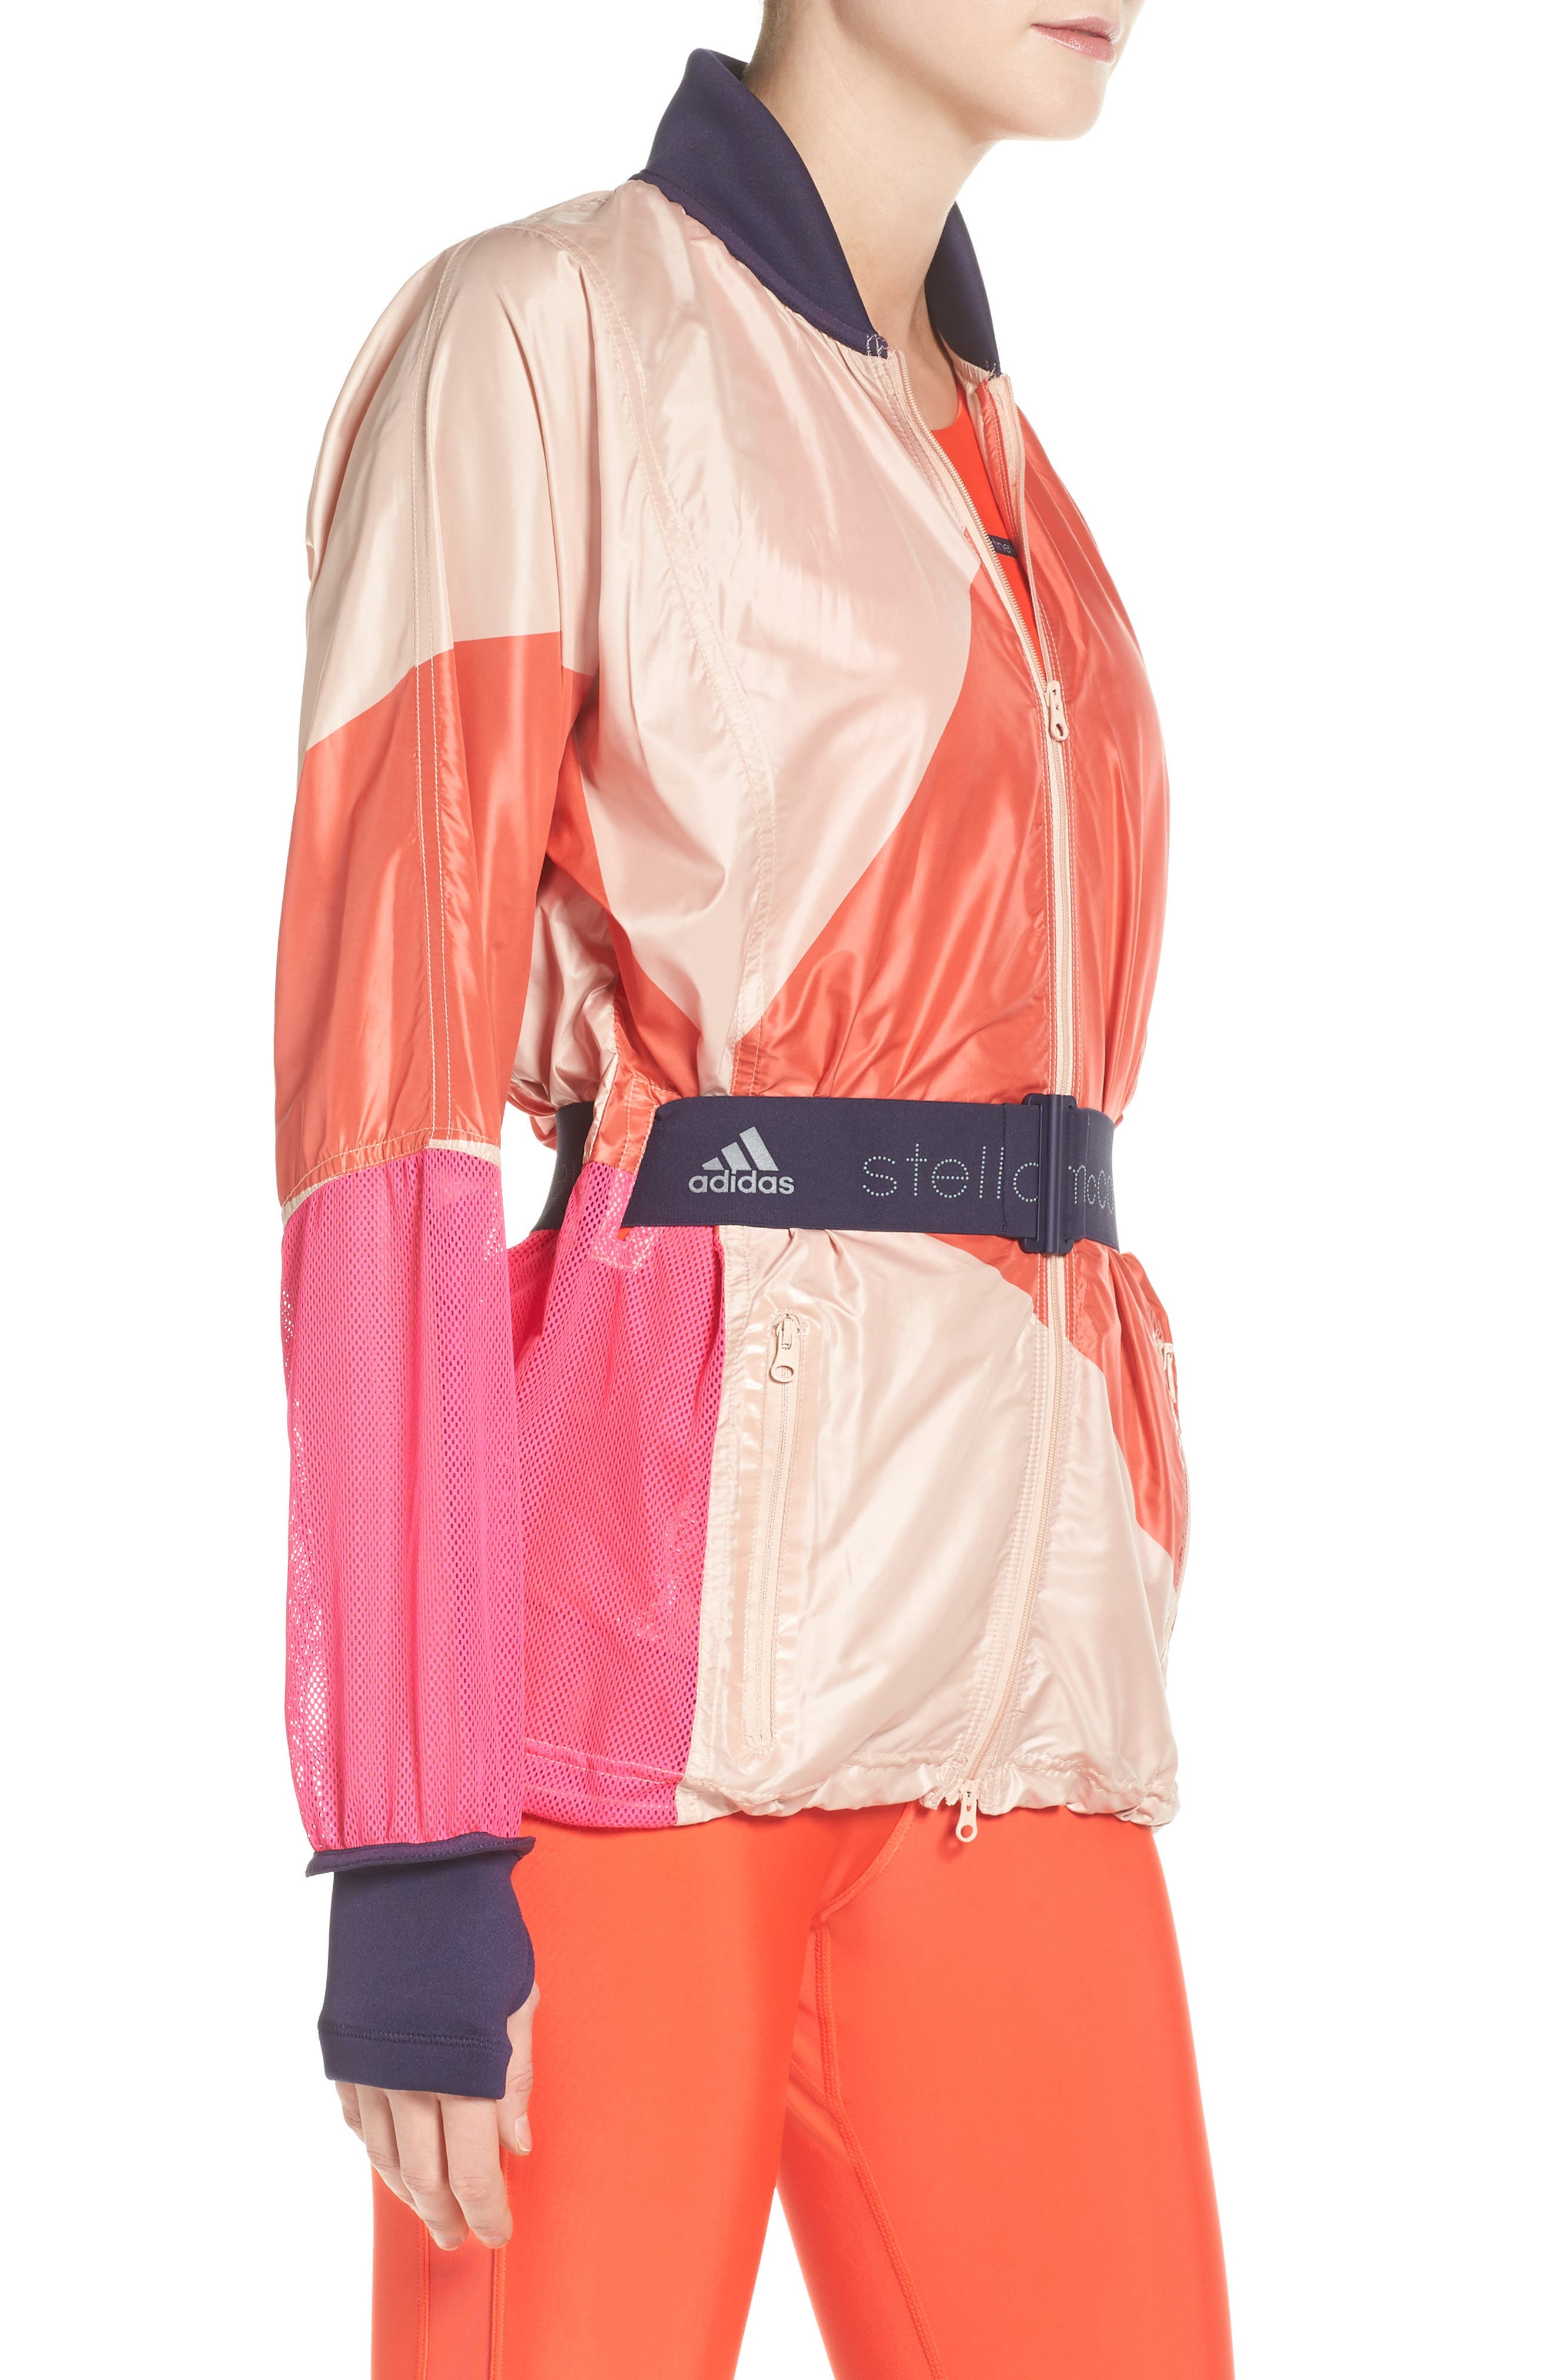 Kite Climastorm<sup>®</sup> Run Jacket,                             Alternate thumbnail 3, color,                             600